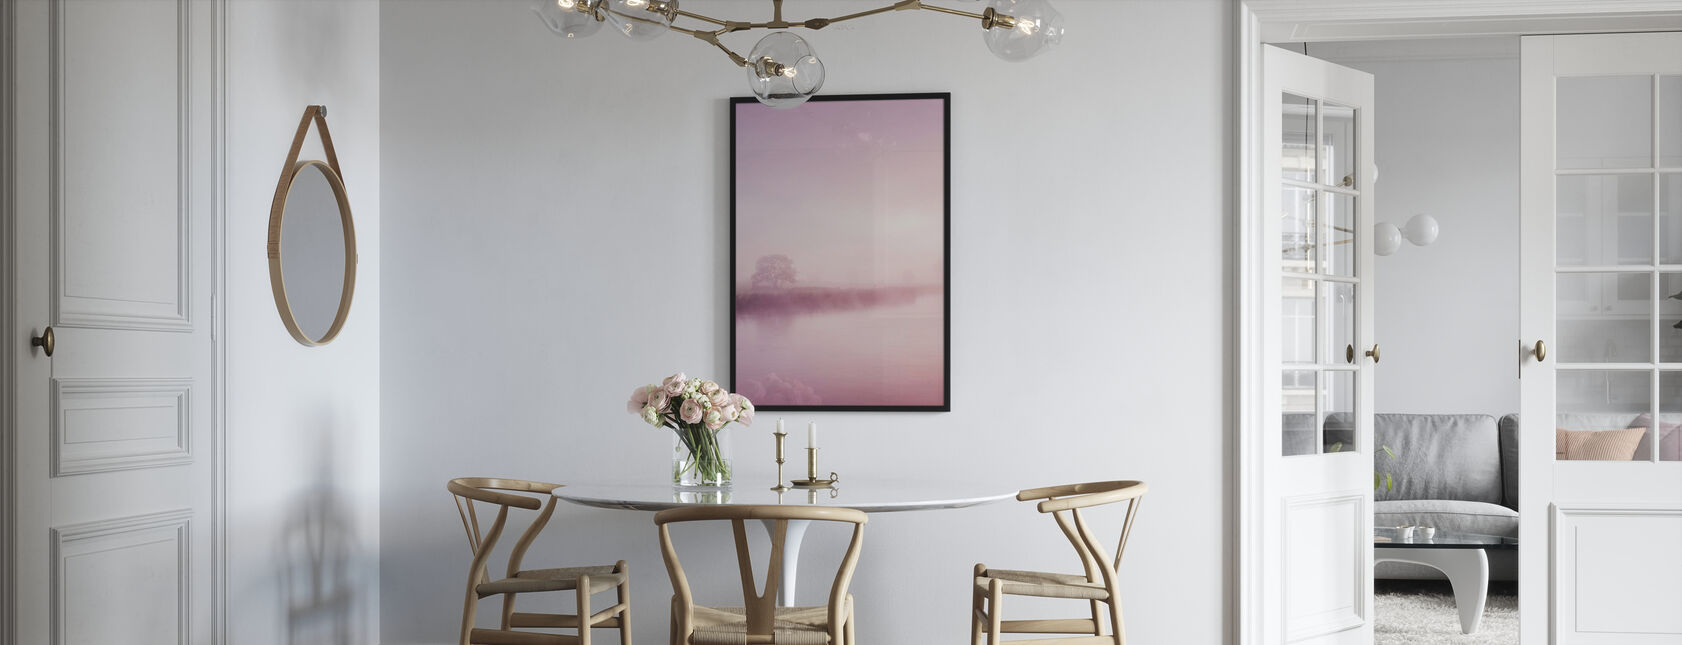 Rose Mist over de rivier de Boyne - Poster - Keuken